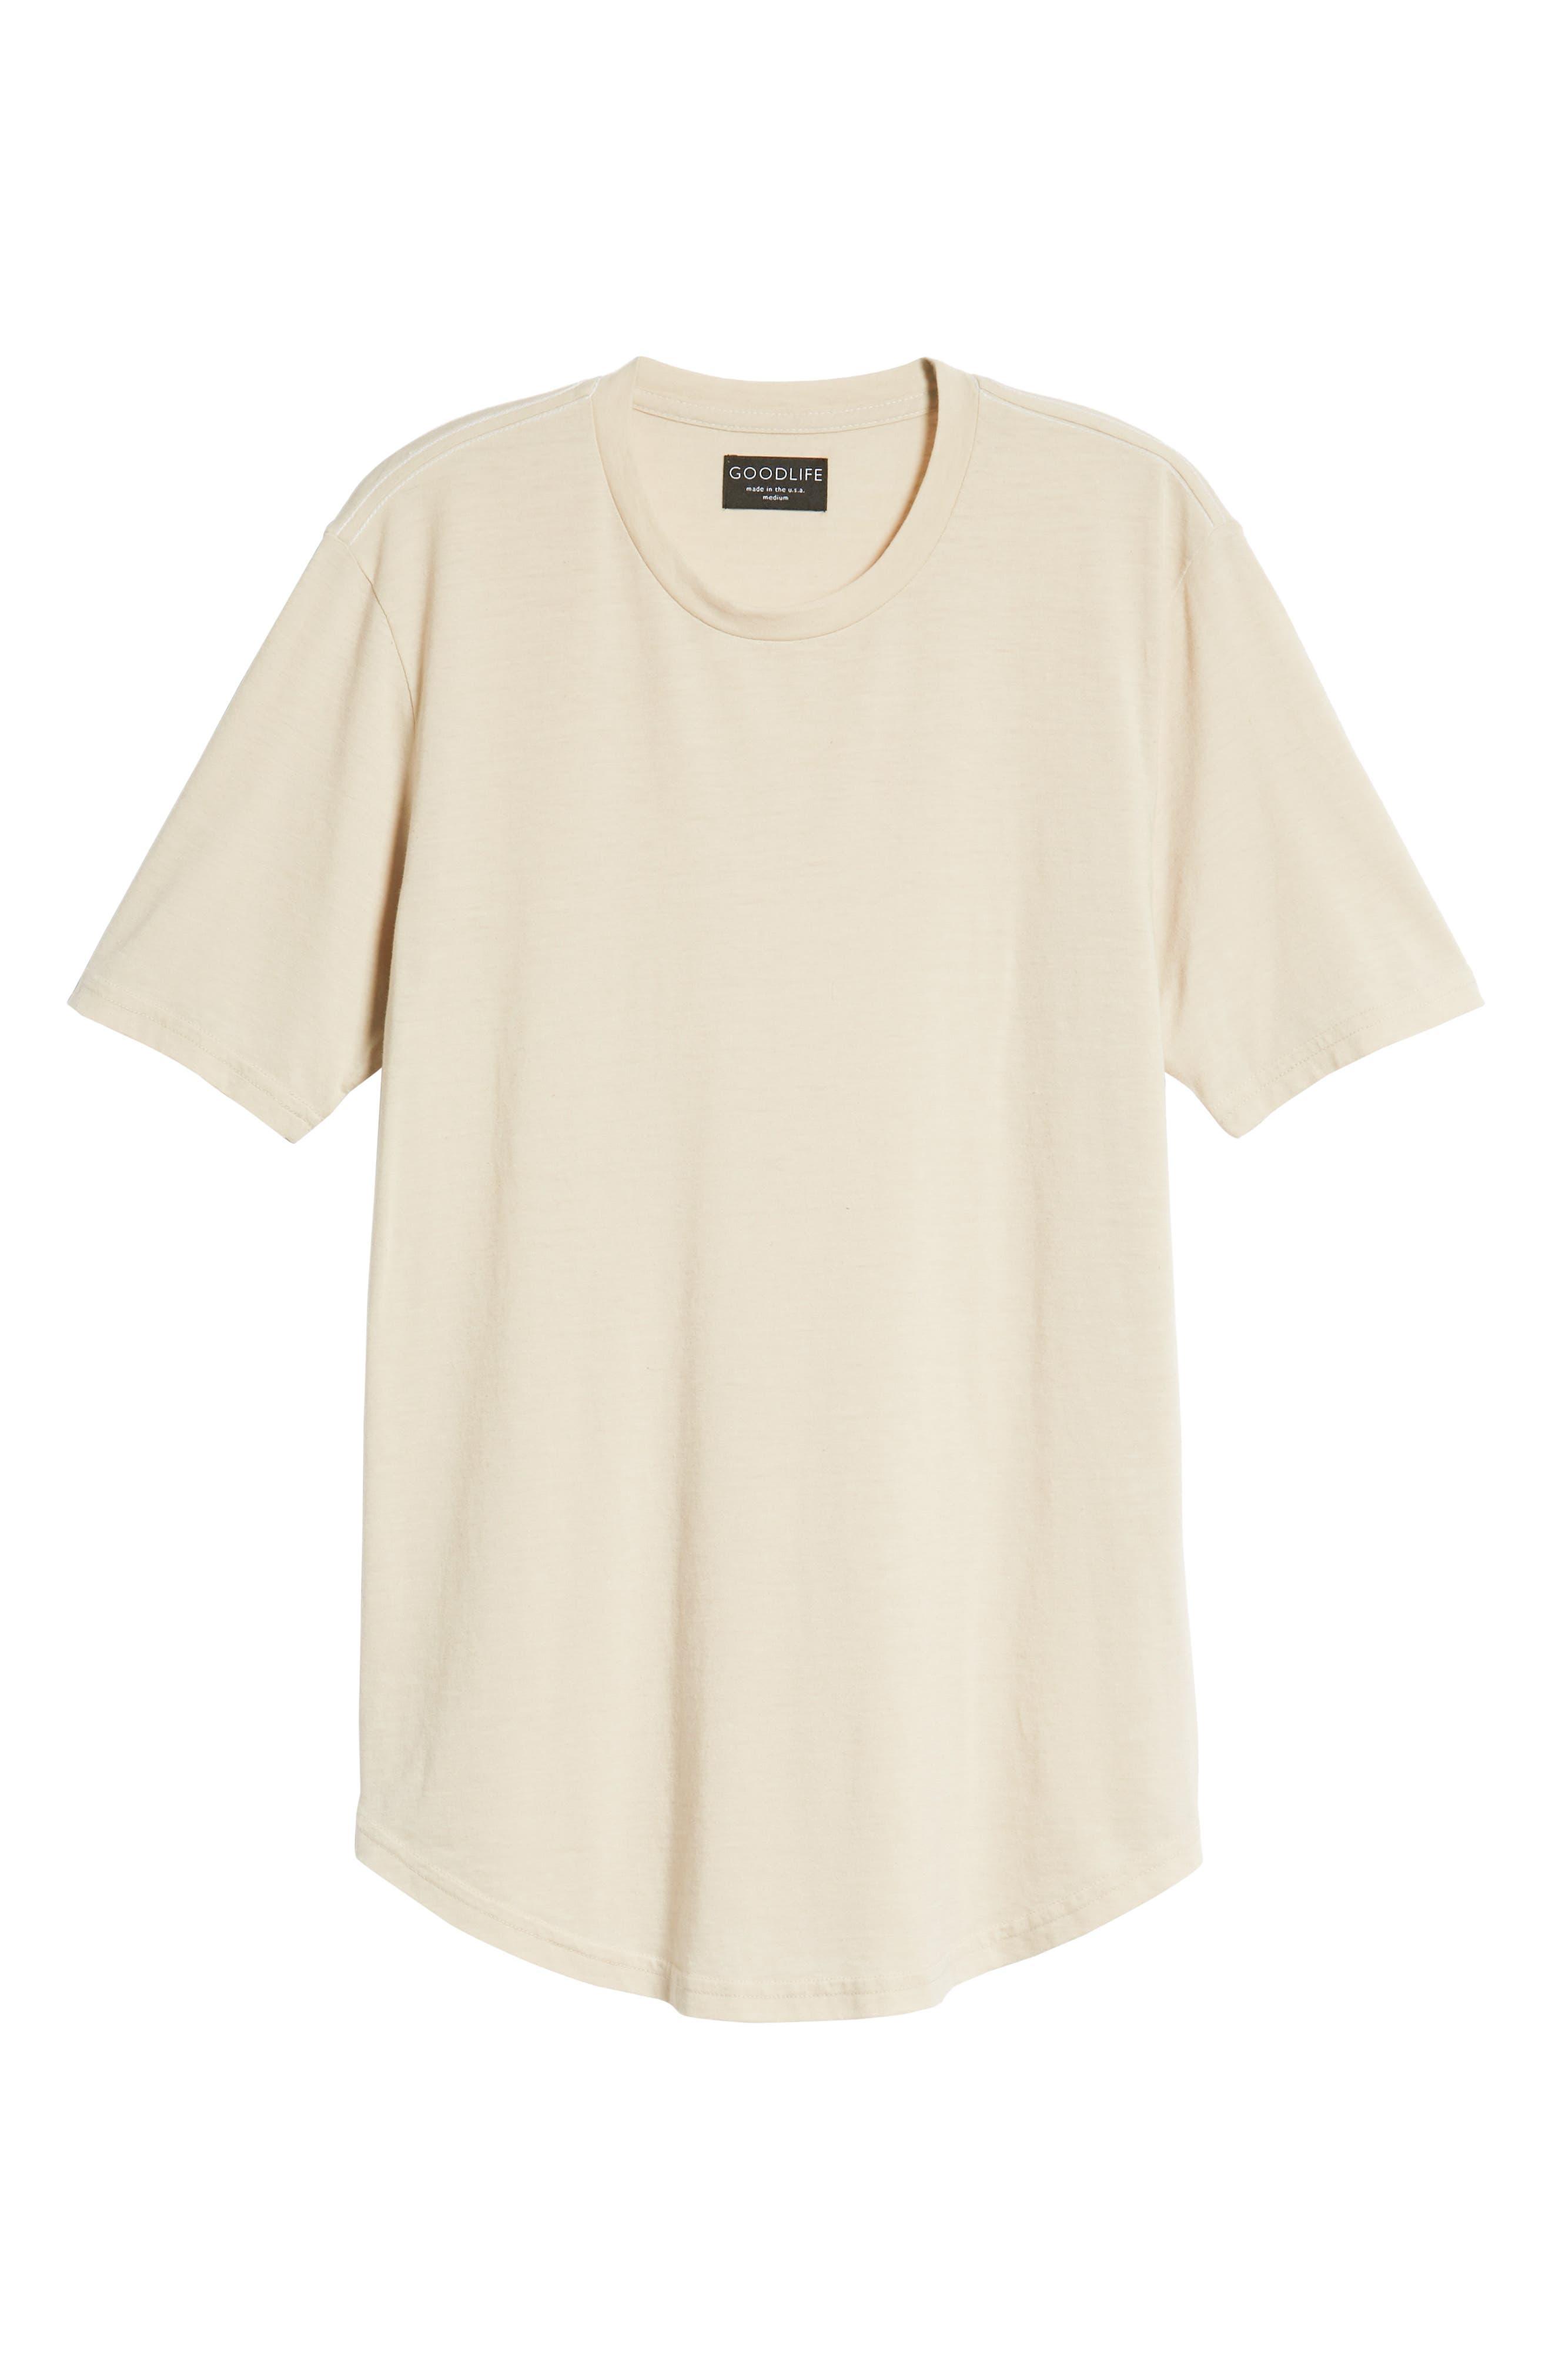 Scallop Triblend Crewneck T-Shirt,                             Alternate thumbnail 6, color,                             OYSTER